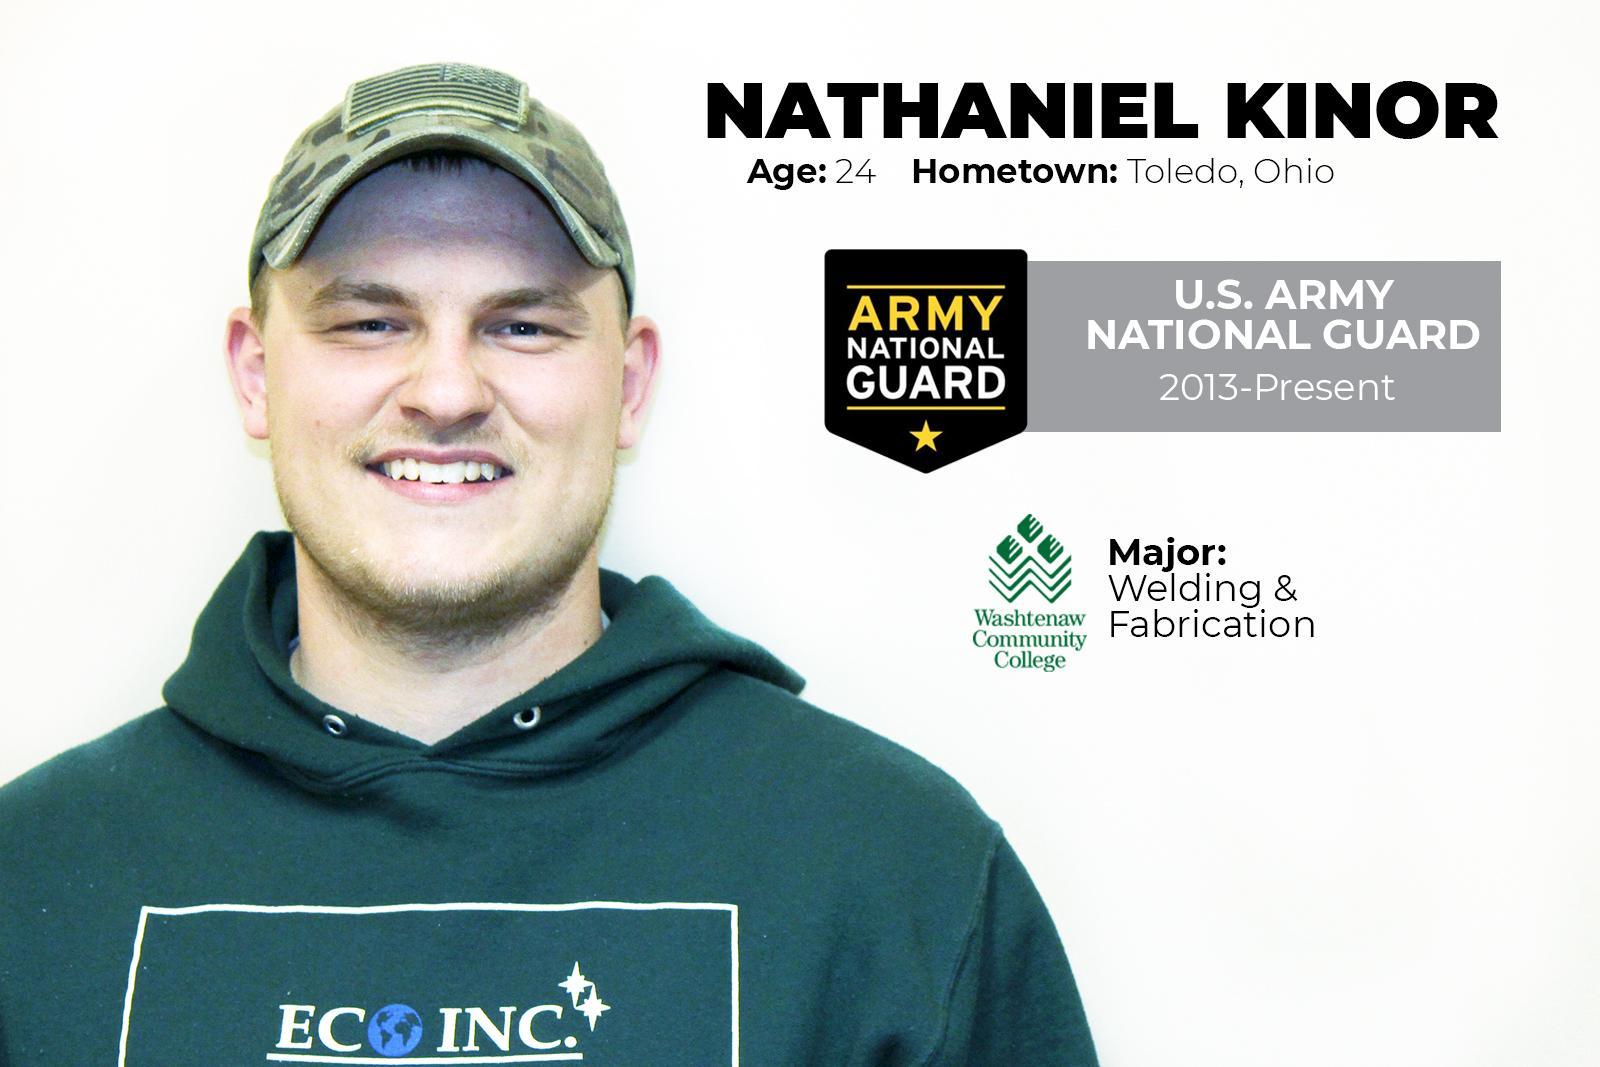 Nathaniel Kinor